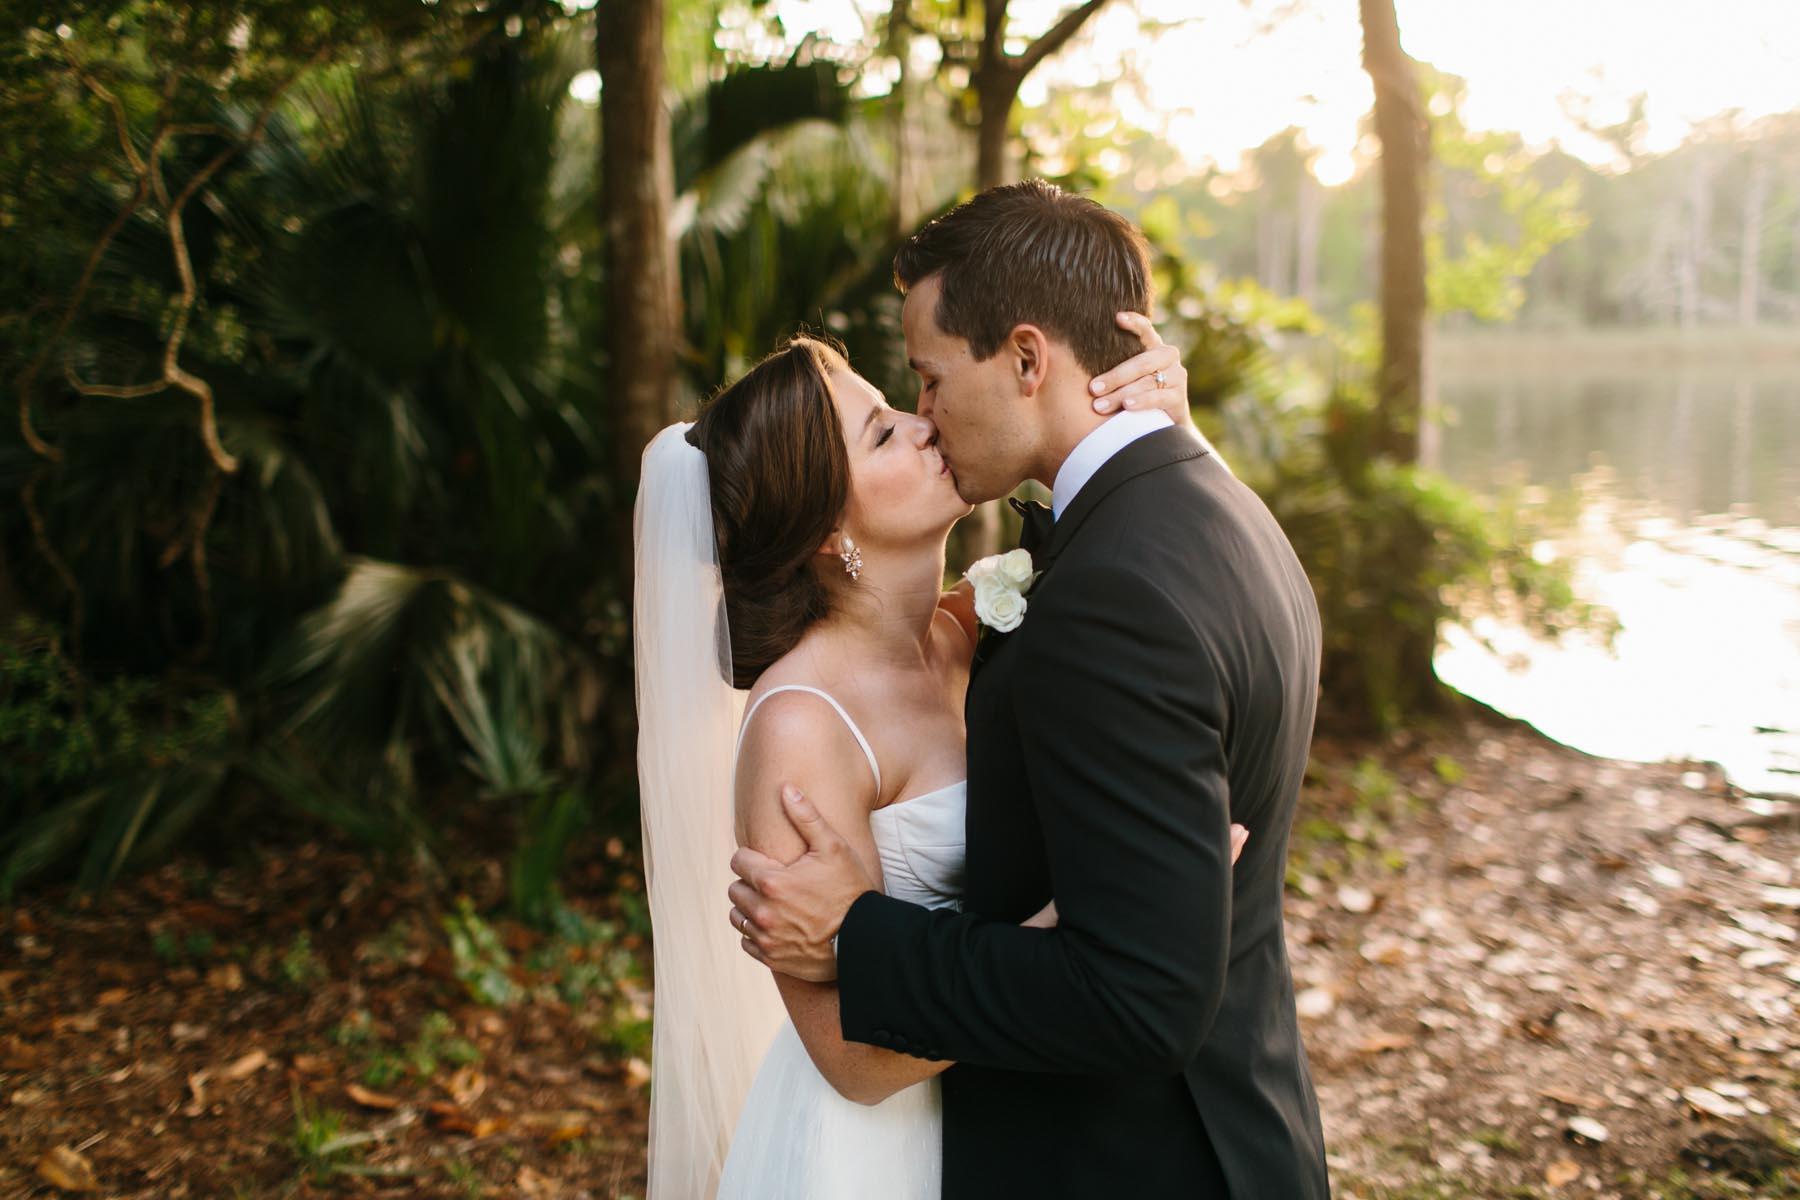 lowry wedding blog eden garden florida wedding-102